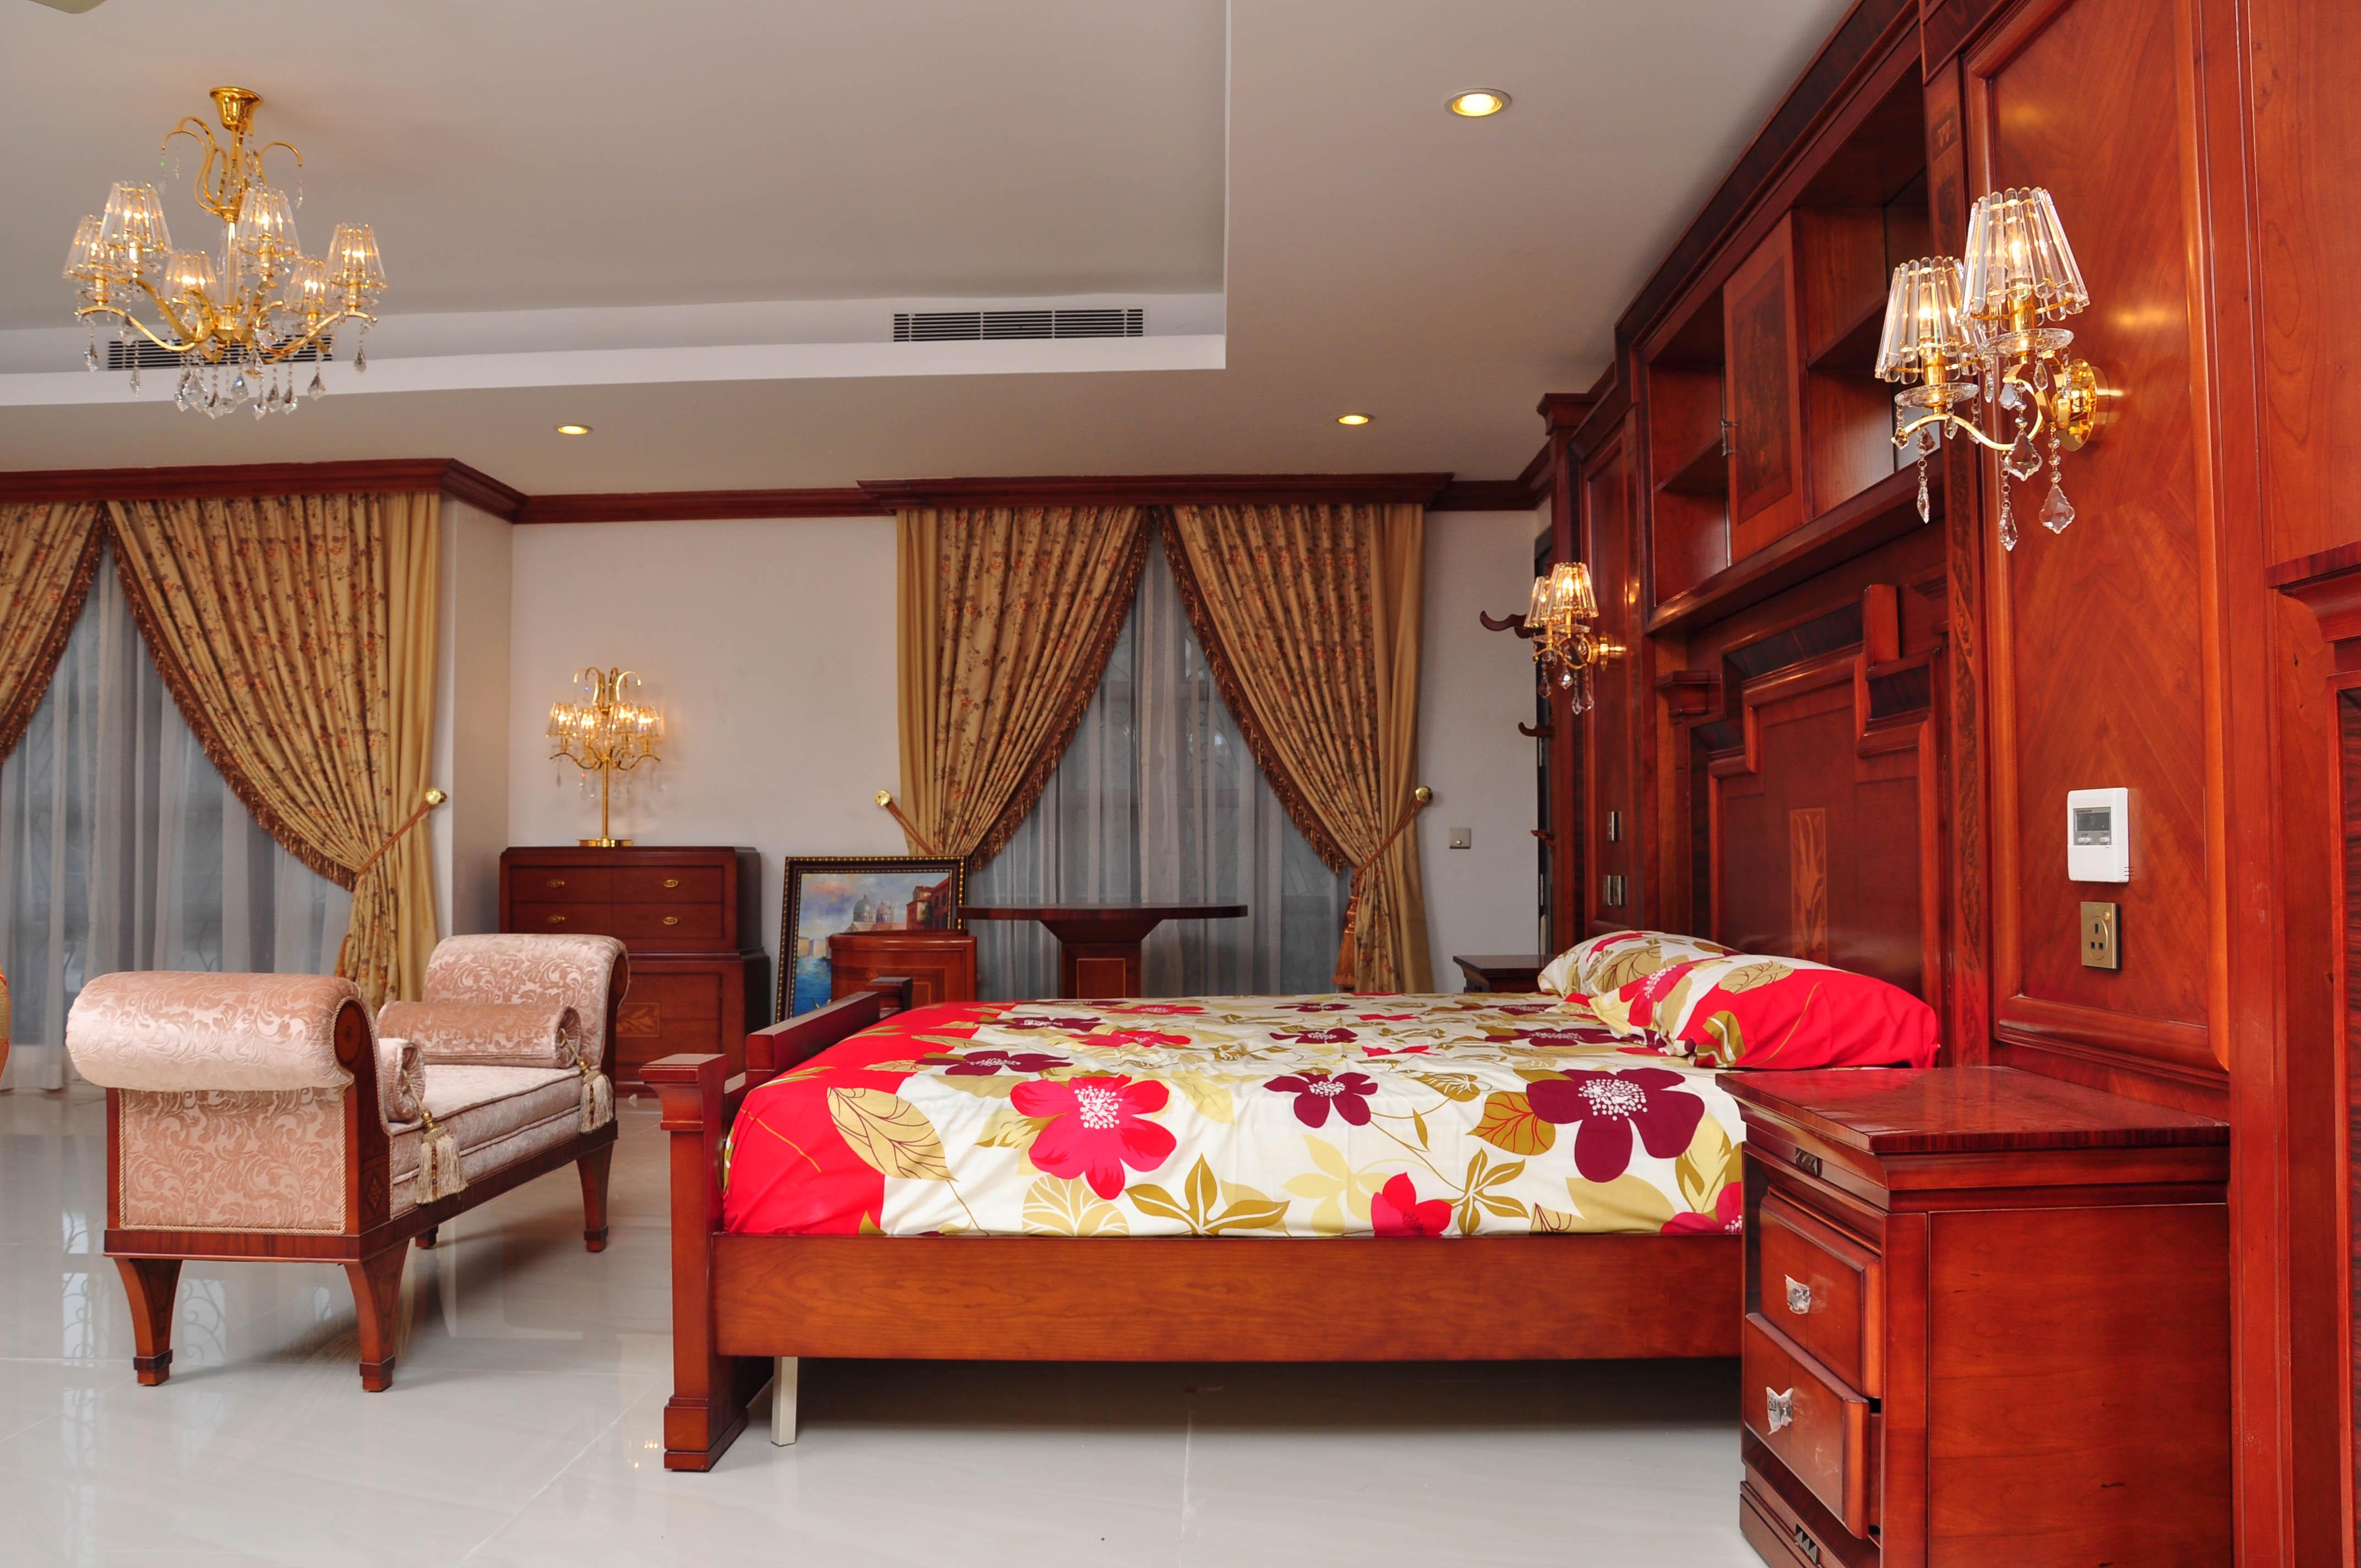 Royal Bedroom, Architect, Light, Wooden, Villa, HQ Photo